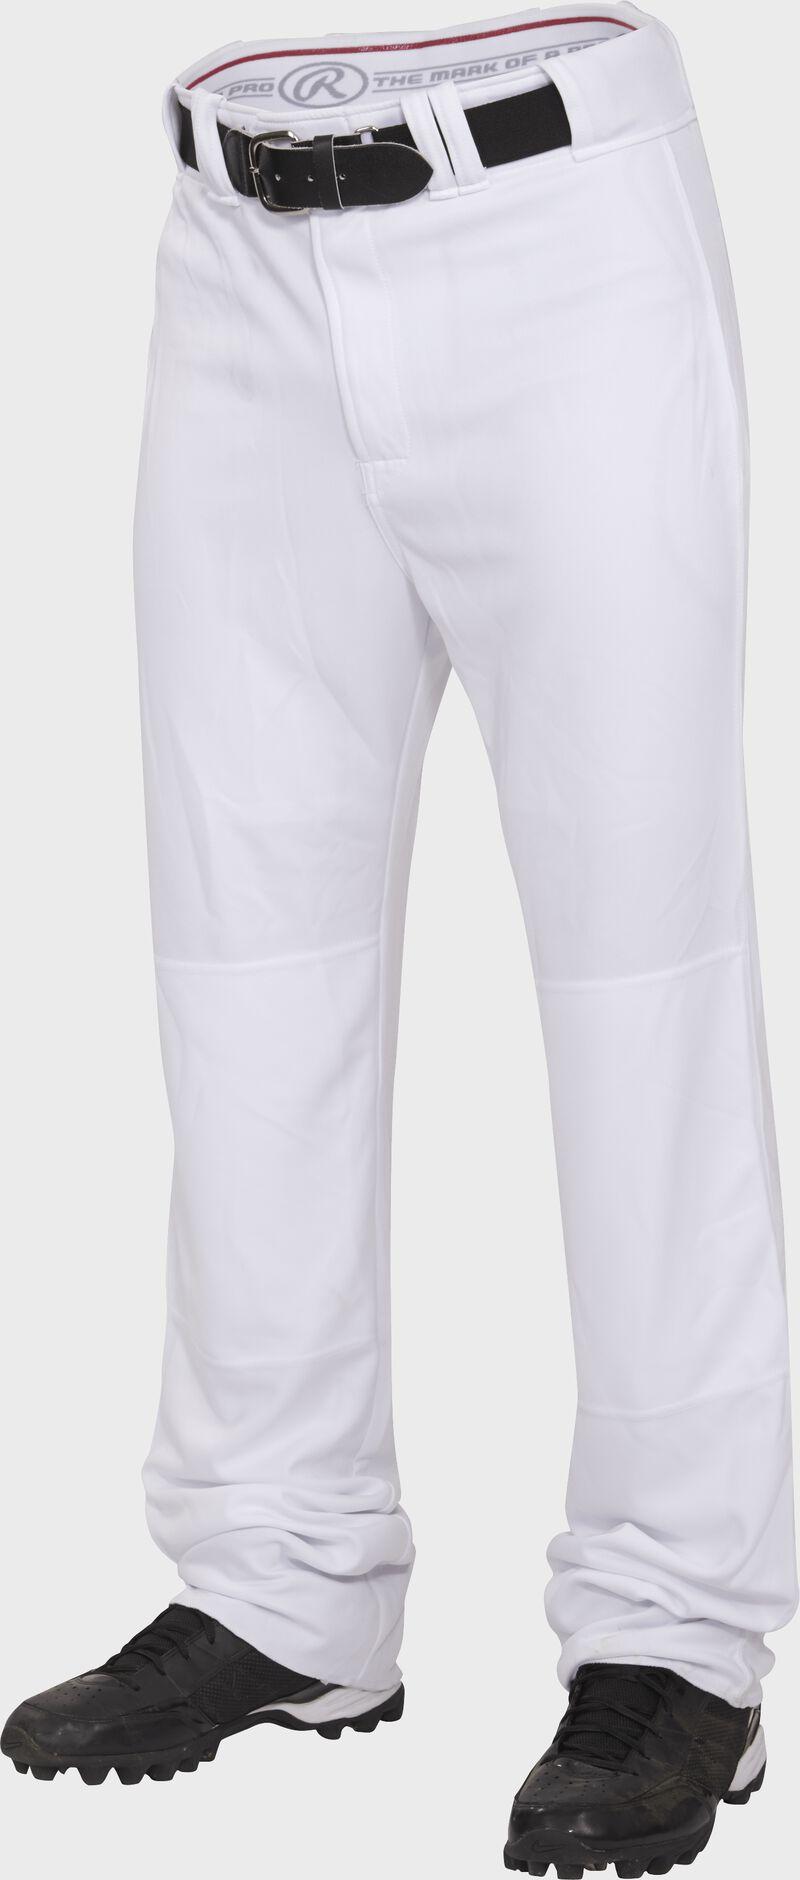 Front of Rawlings White Youth Premium Straight Pant - SKU #BPU150-BG-88